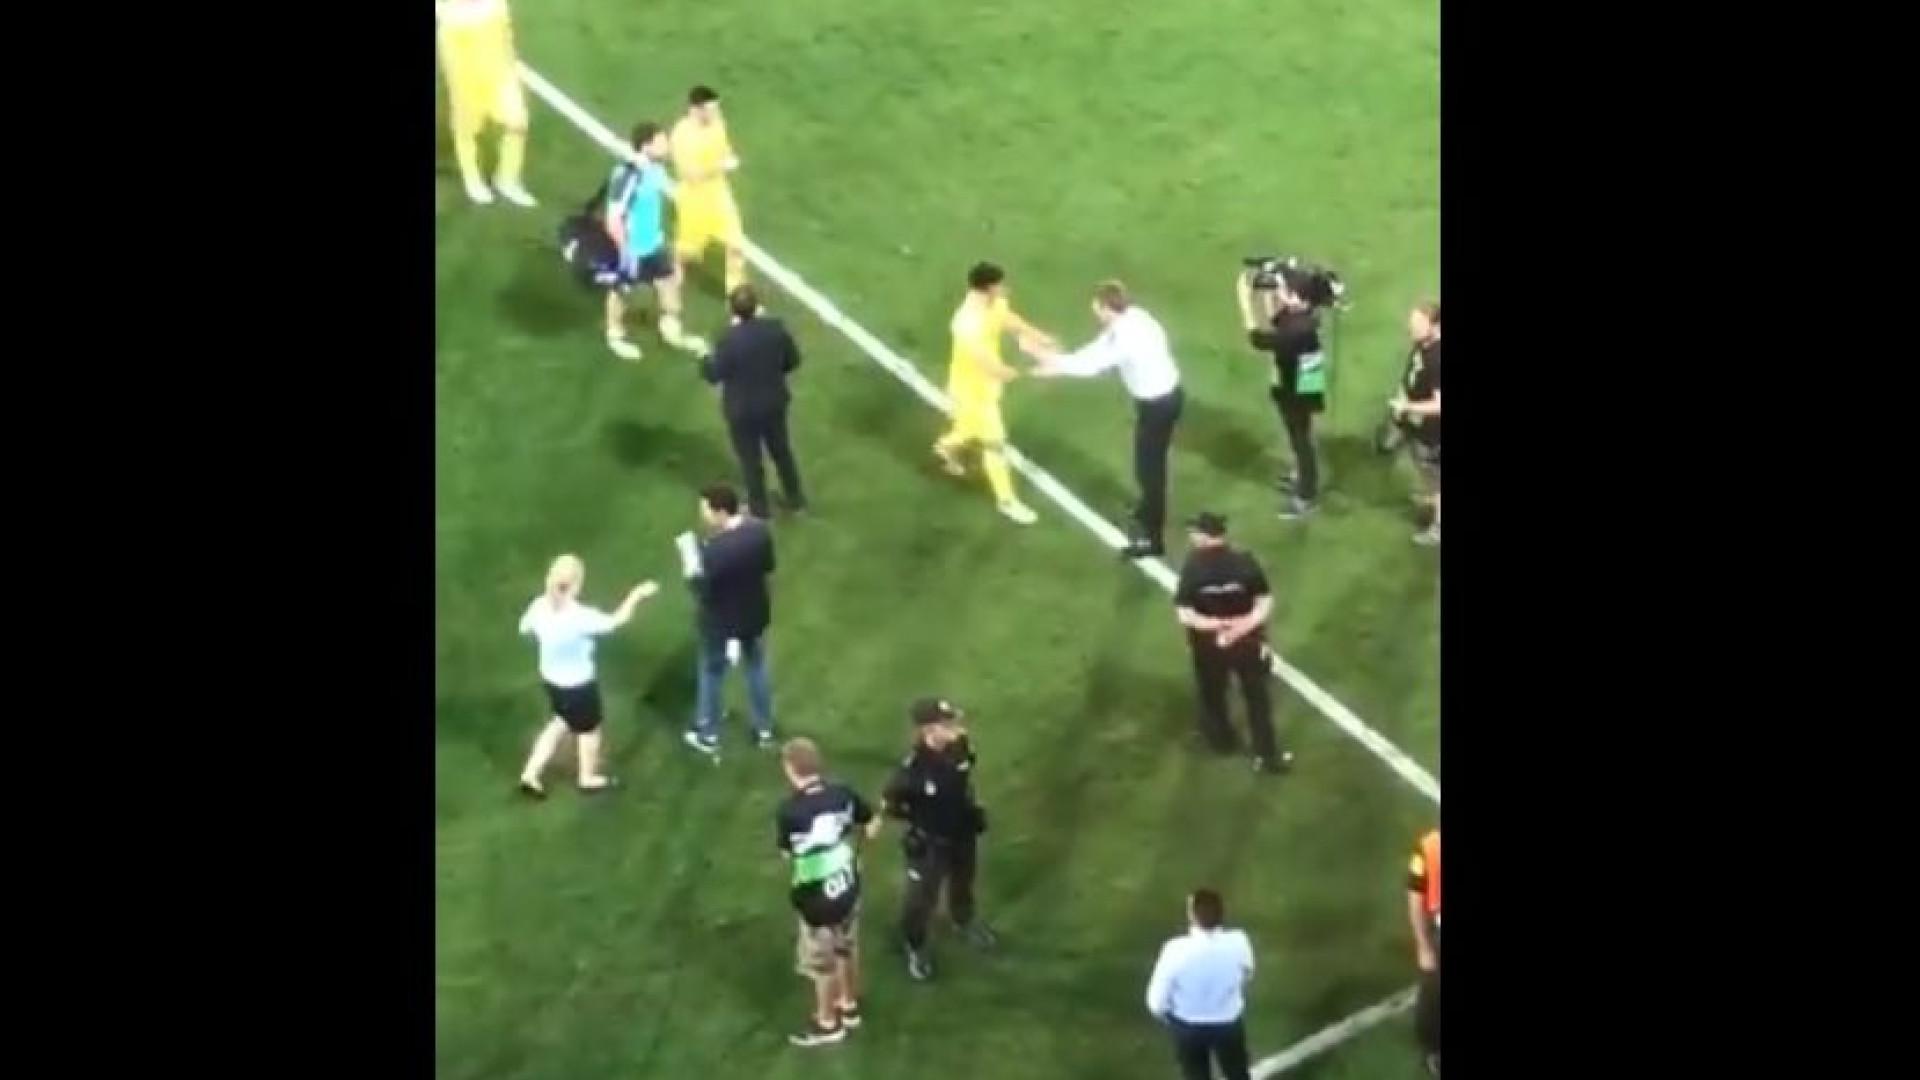 O gesto de Gerrard que apaixonou a imprensa mundial